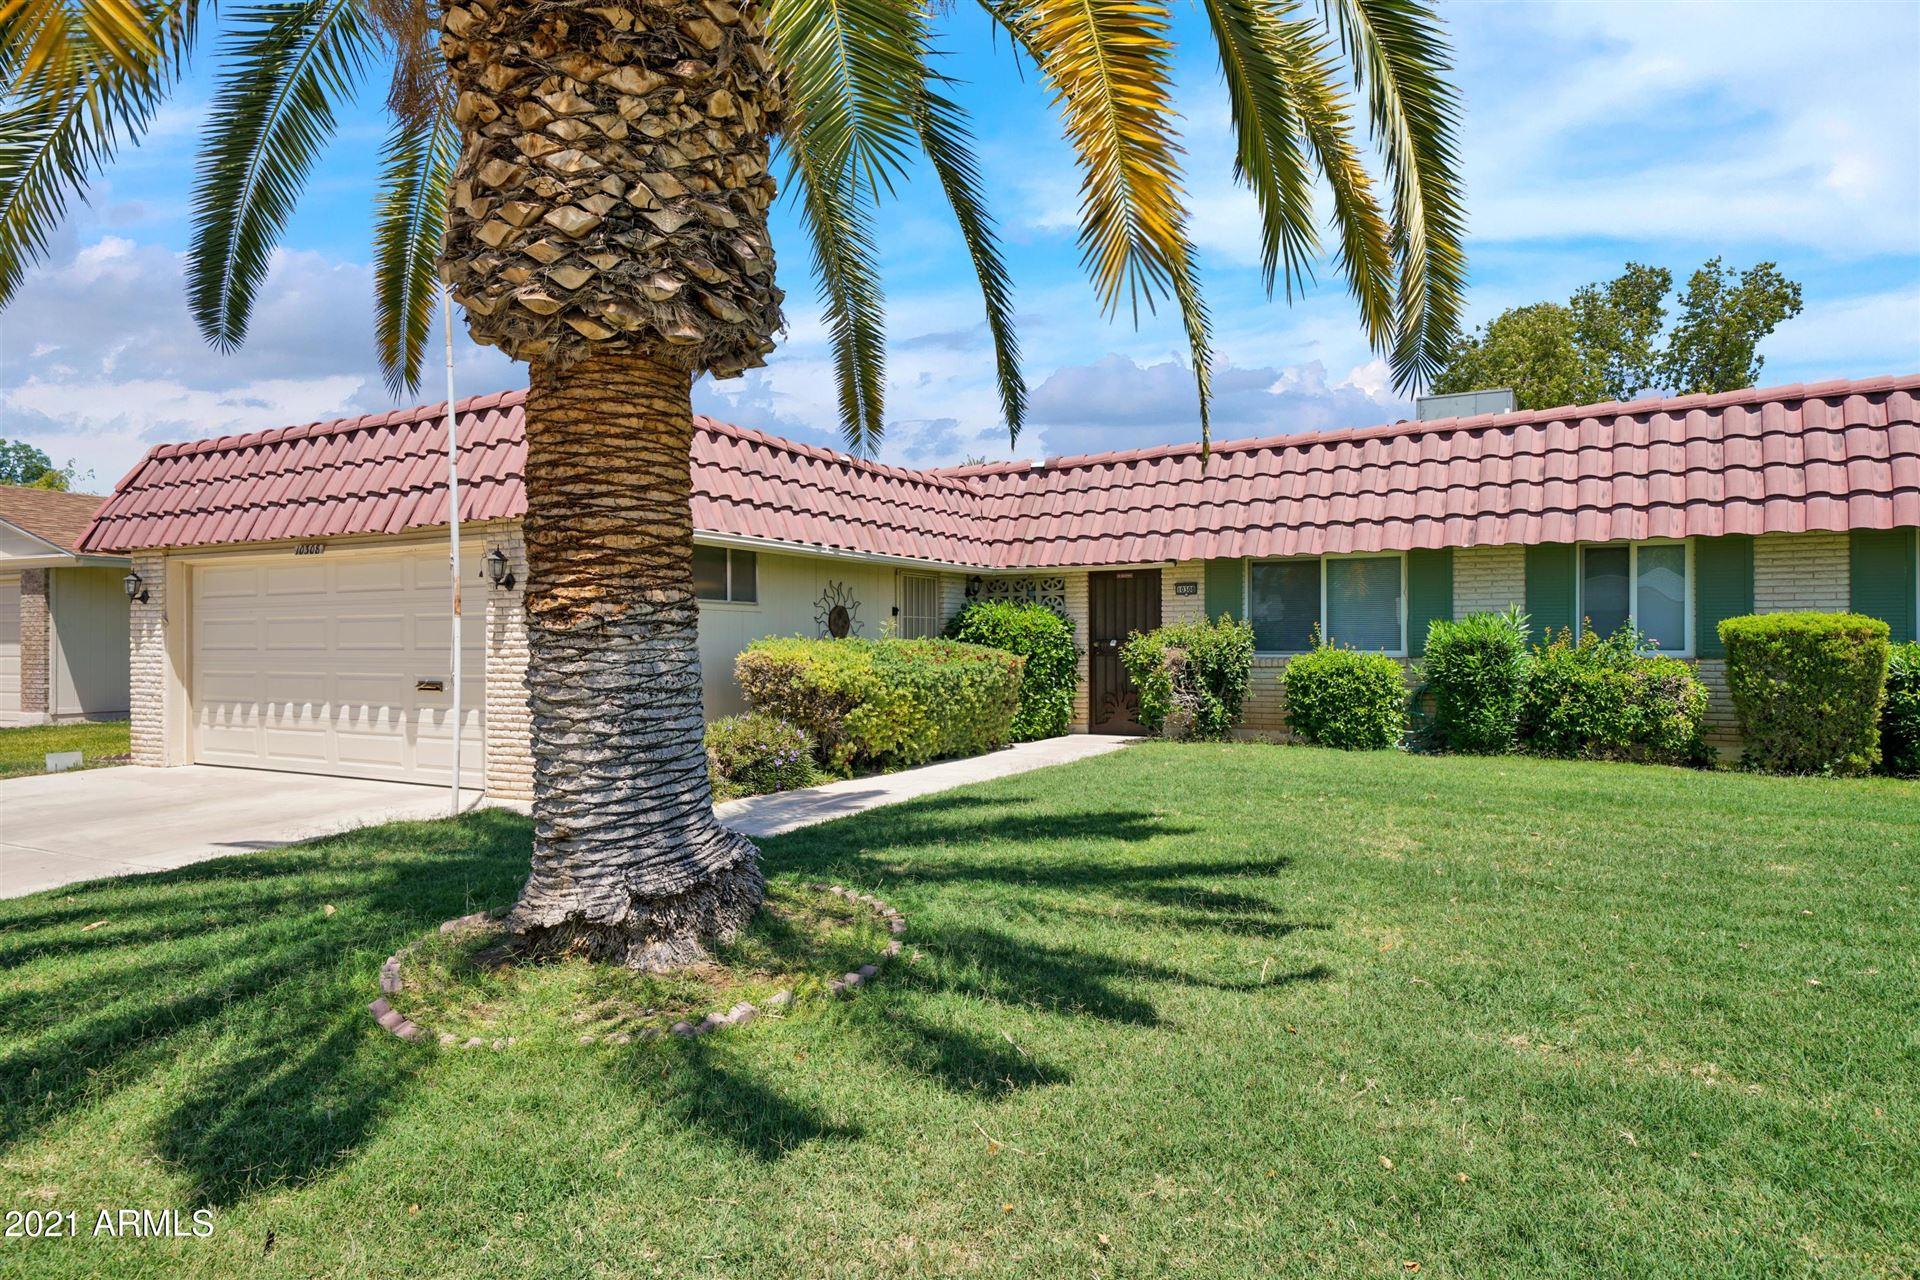 10308 W KINGSWOOD Circle, Sun City, AZ 85351 - MLS#: 6227205